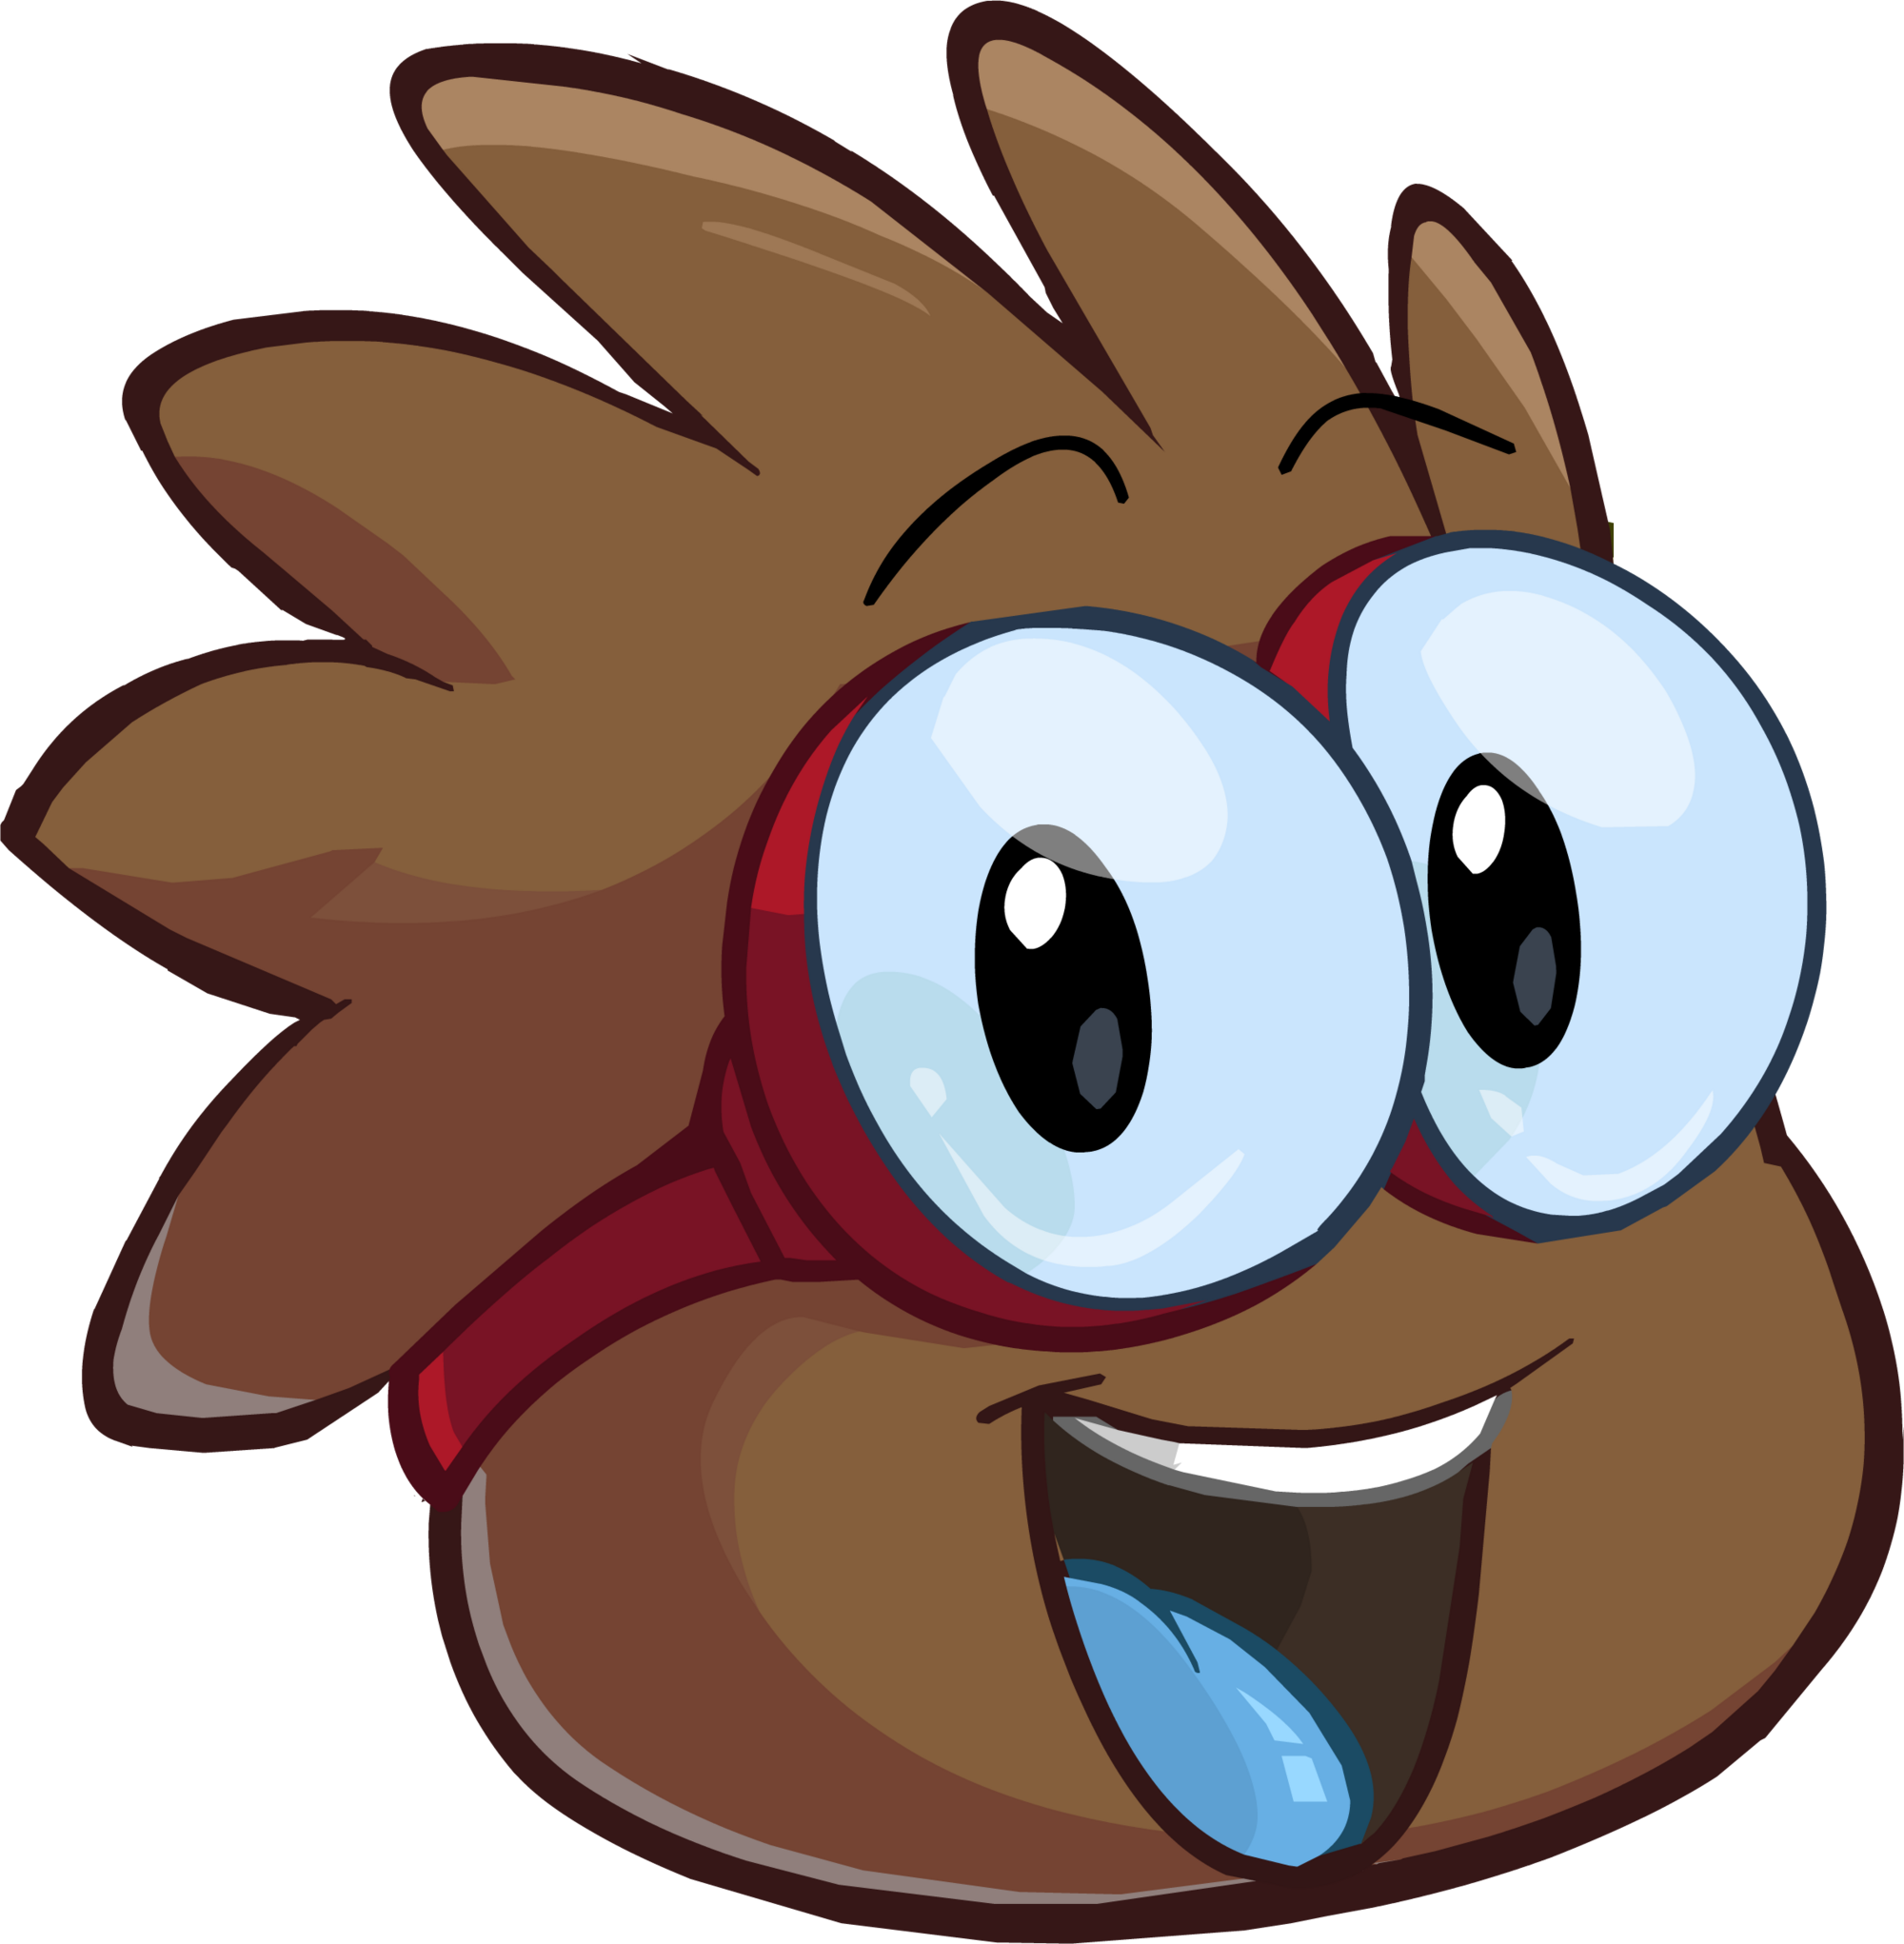 puffle club penguin wiki fandom powered by wikia